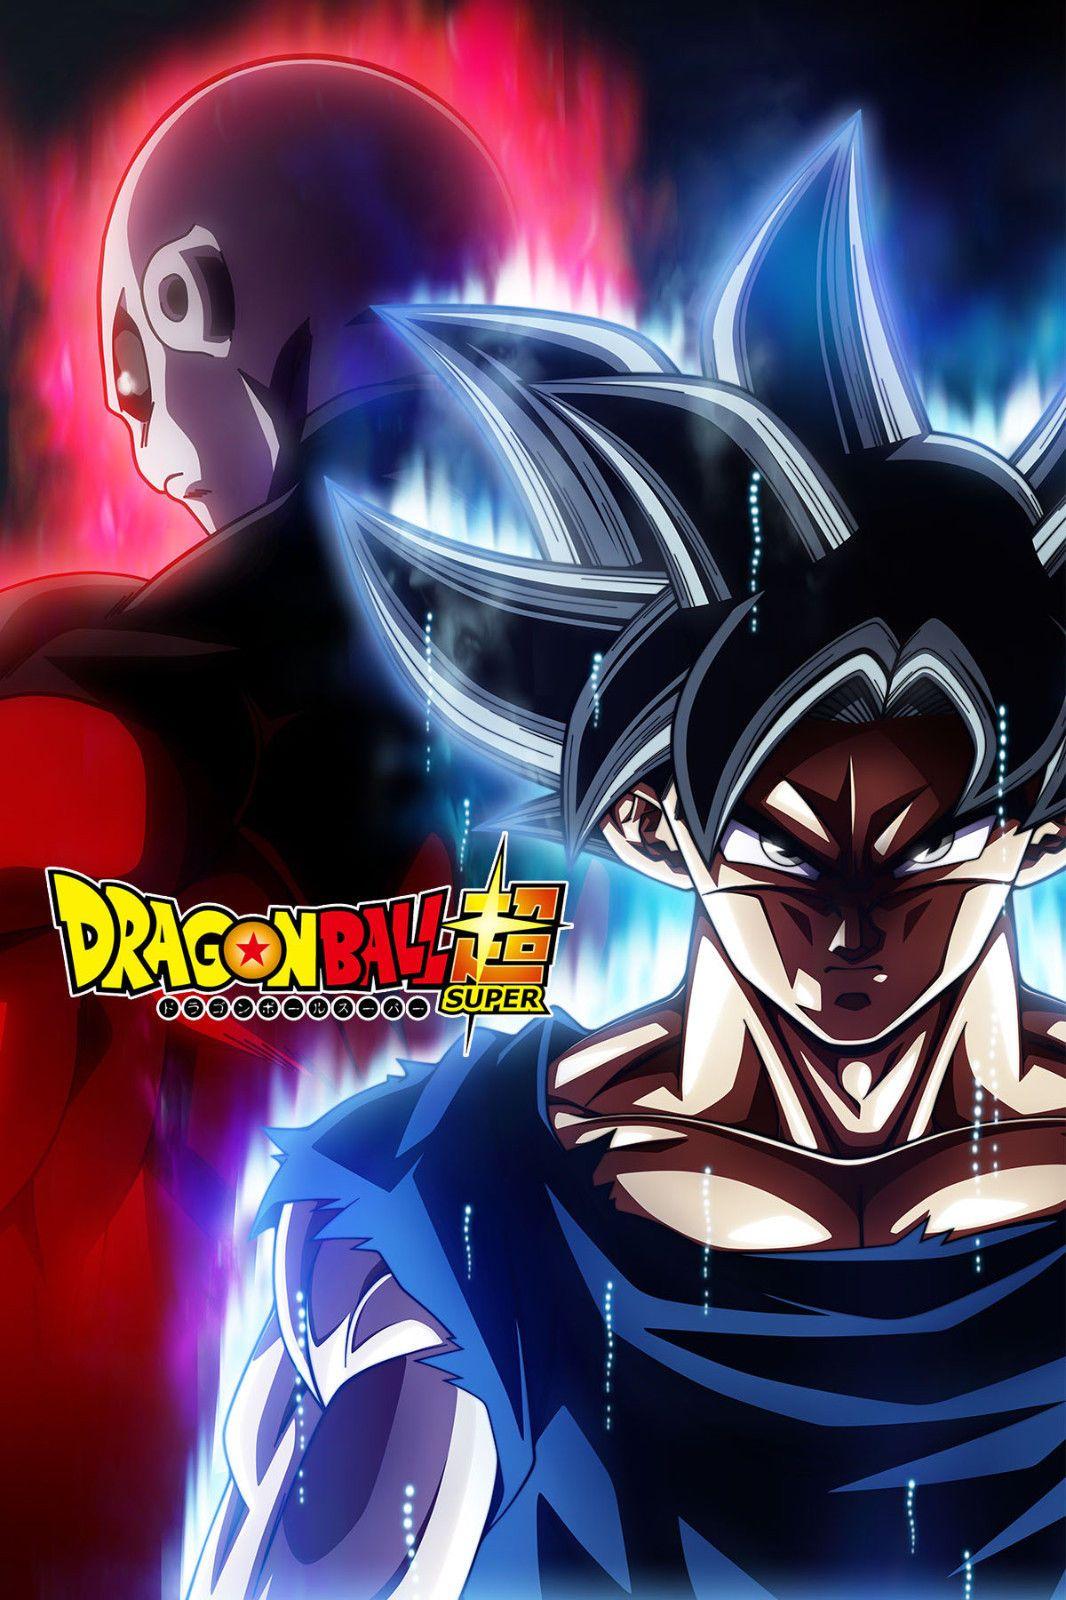 Dragon Ball Super Poster Goku Ultra And Jiren 12inx18in Free Shipping Ebay Dragon Ball Super Dragon Ball Wallpapers Dragon Ball Super Goku